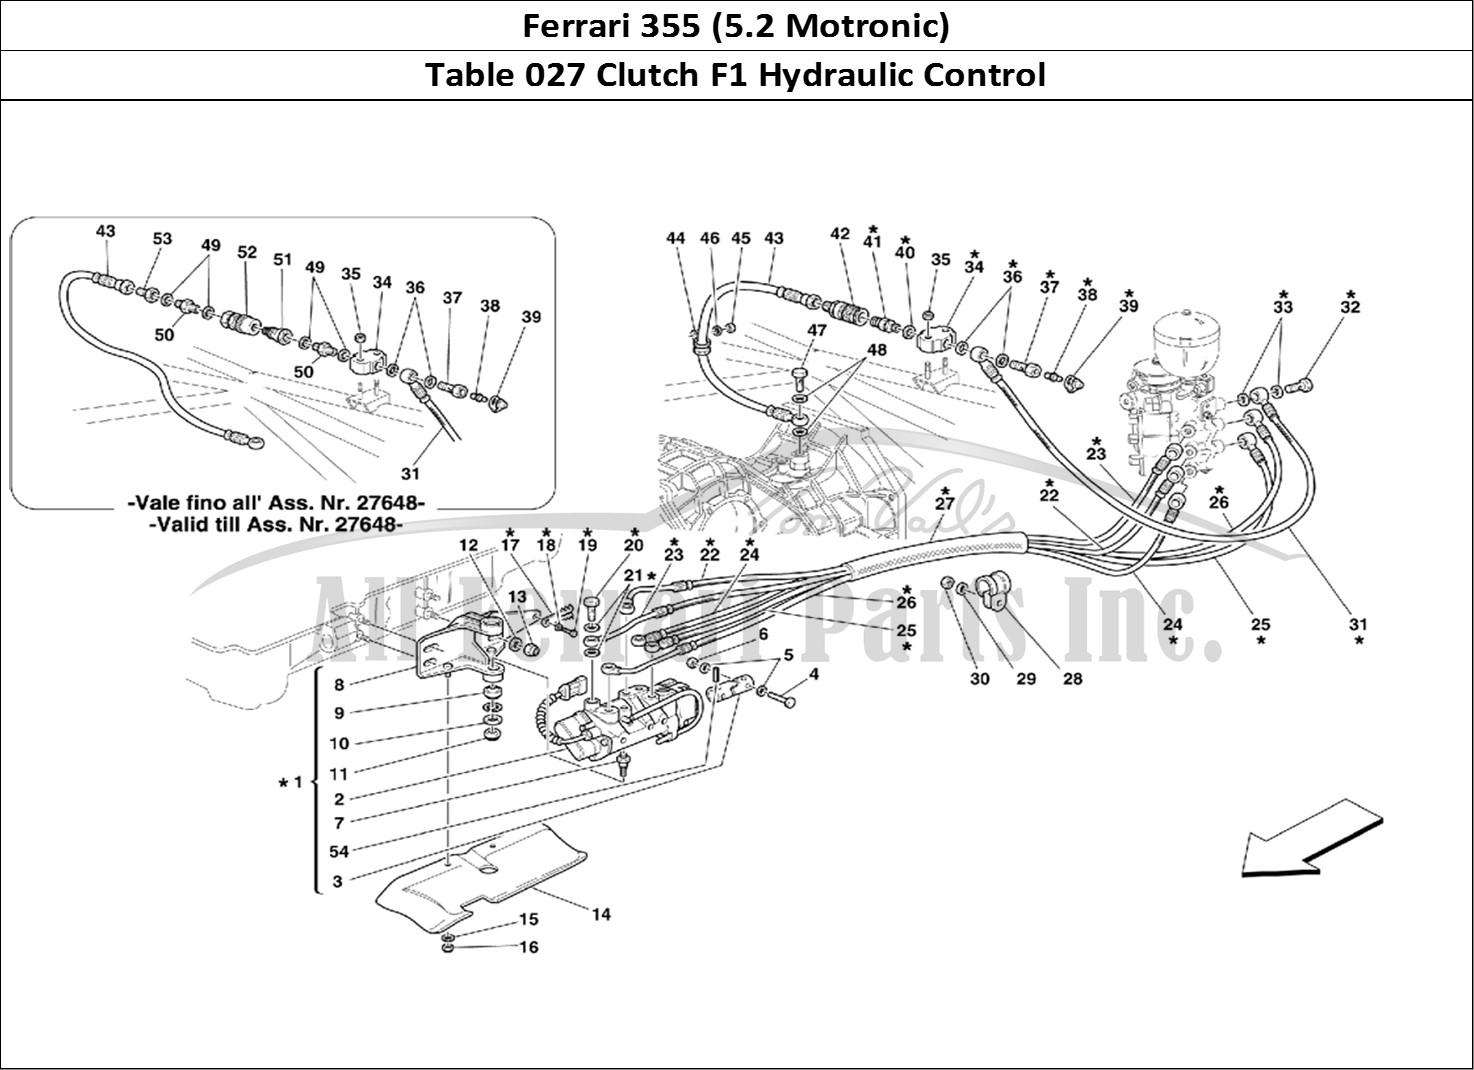 Buy original Ferrari 355 (5.2 Motronic) 027 Clutch F1